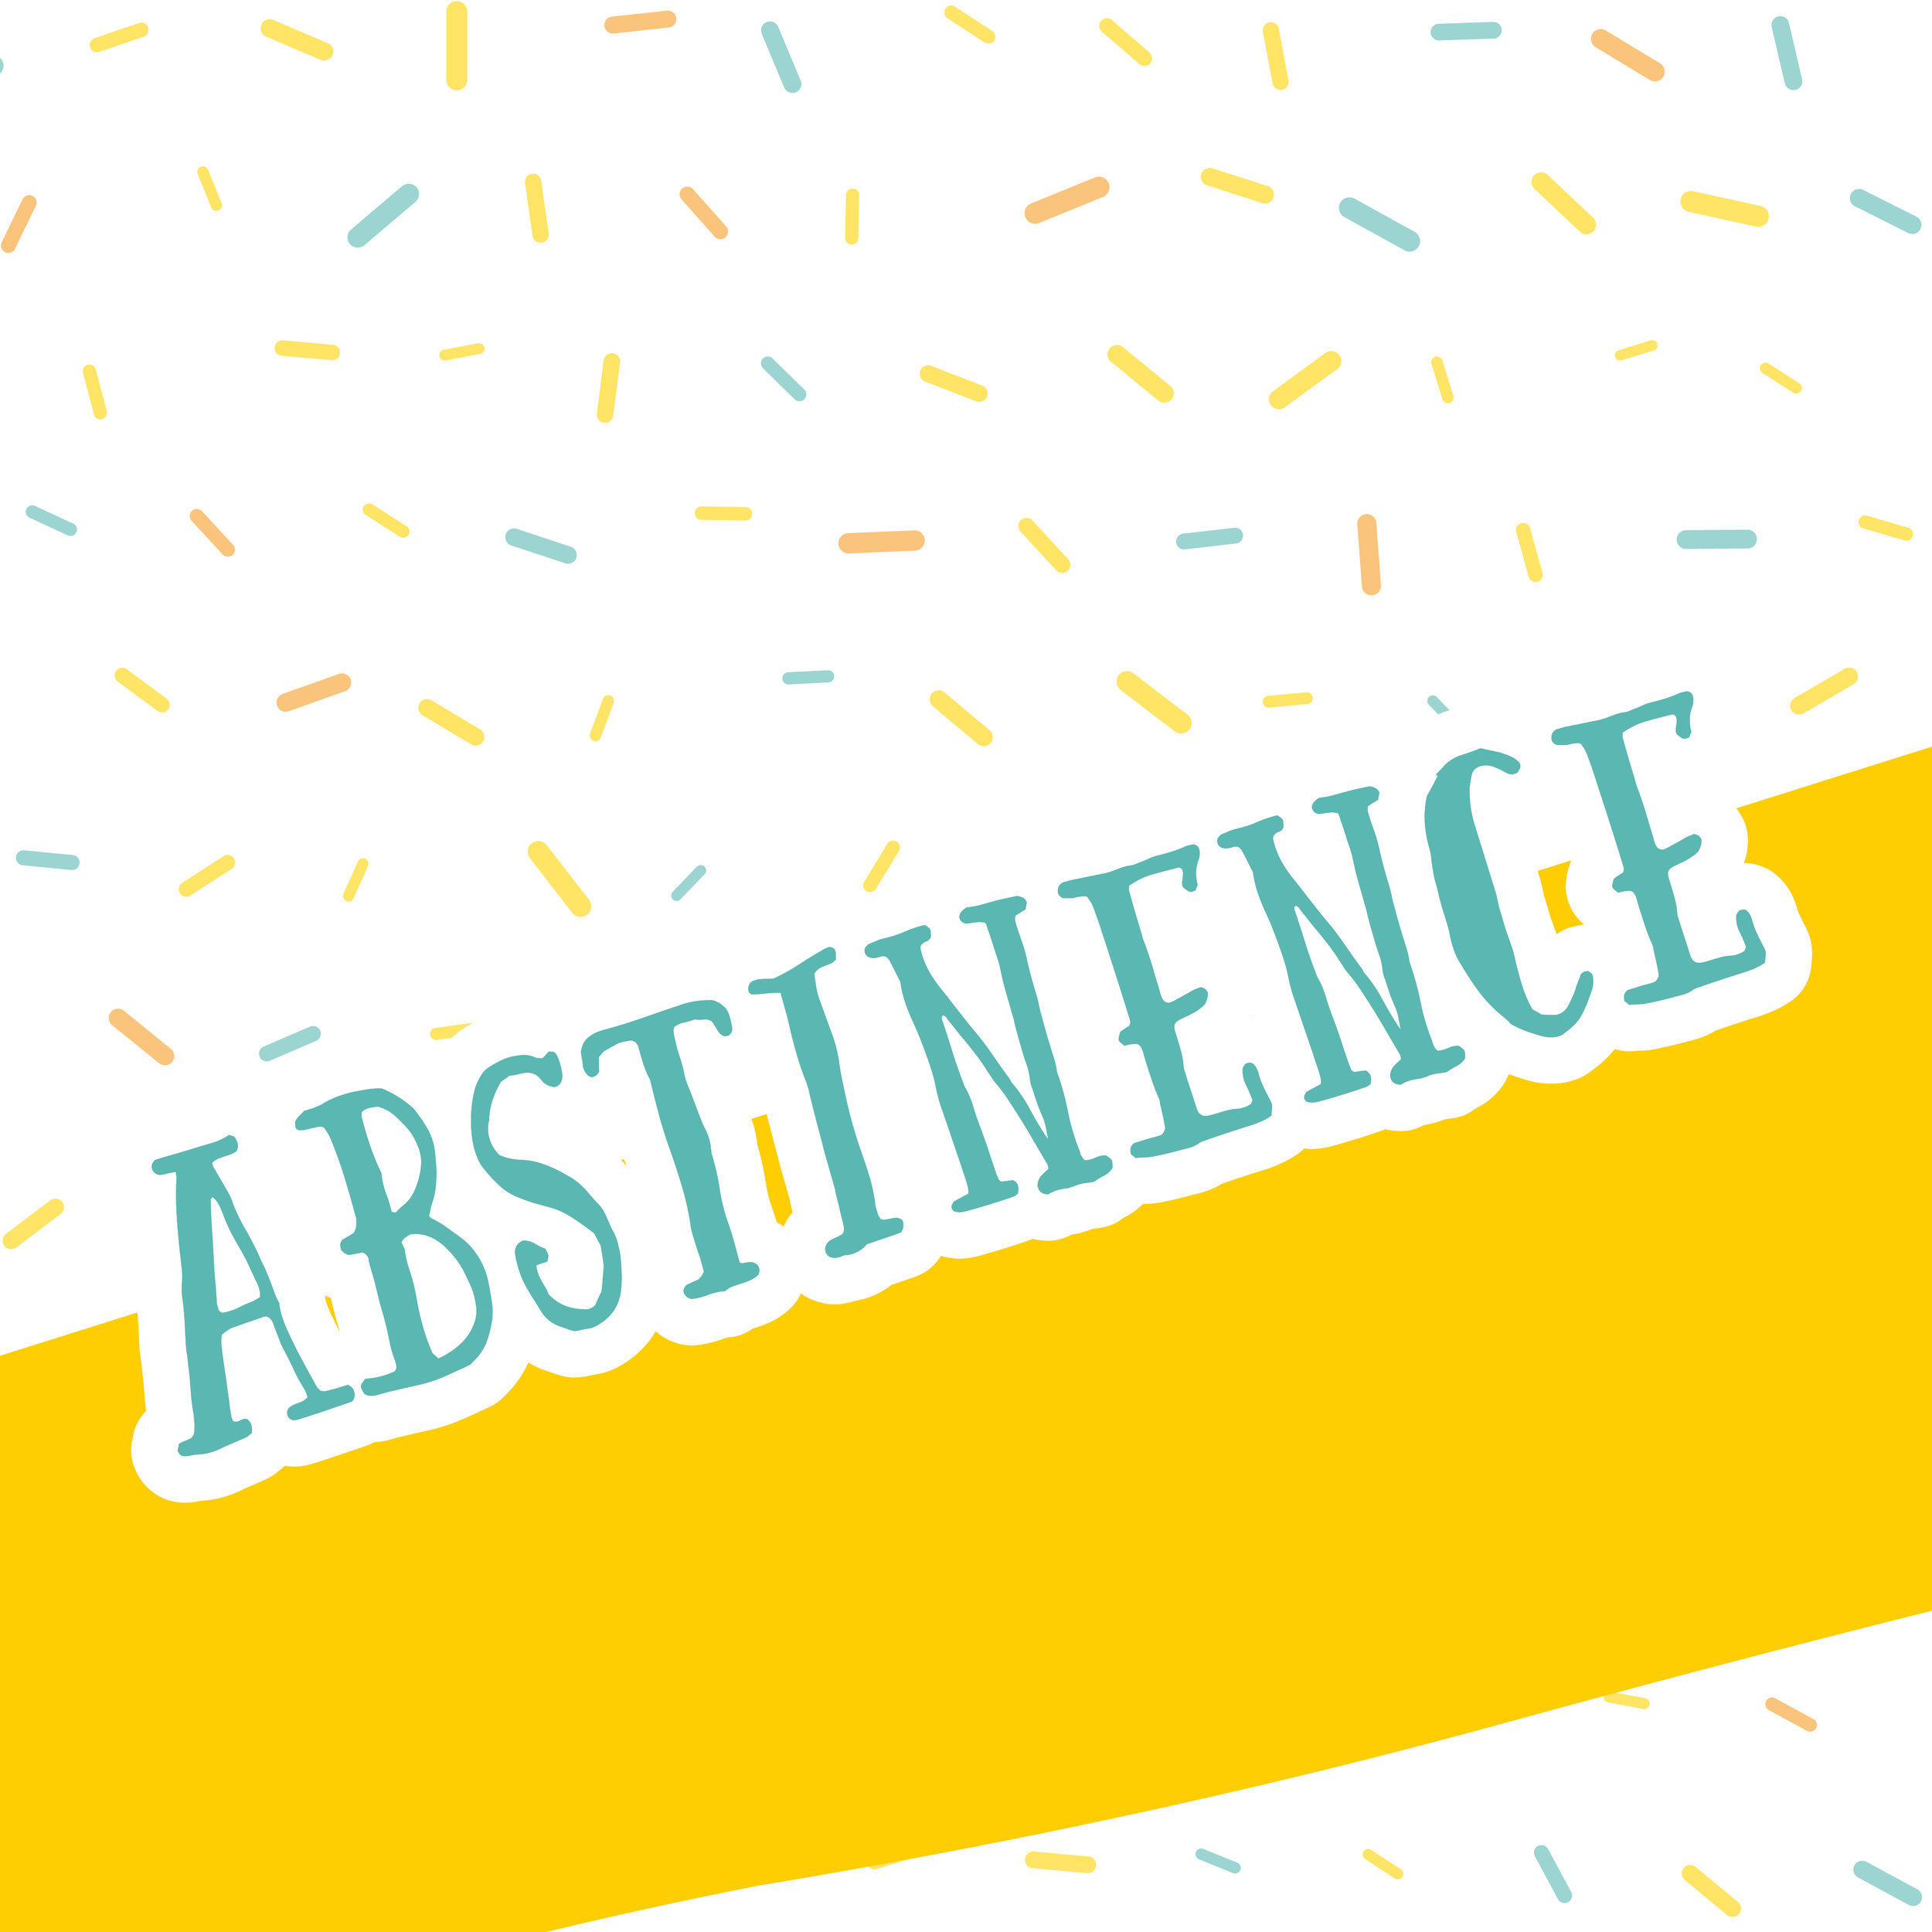 BC_Abstinence.jpg